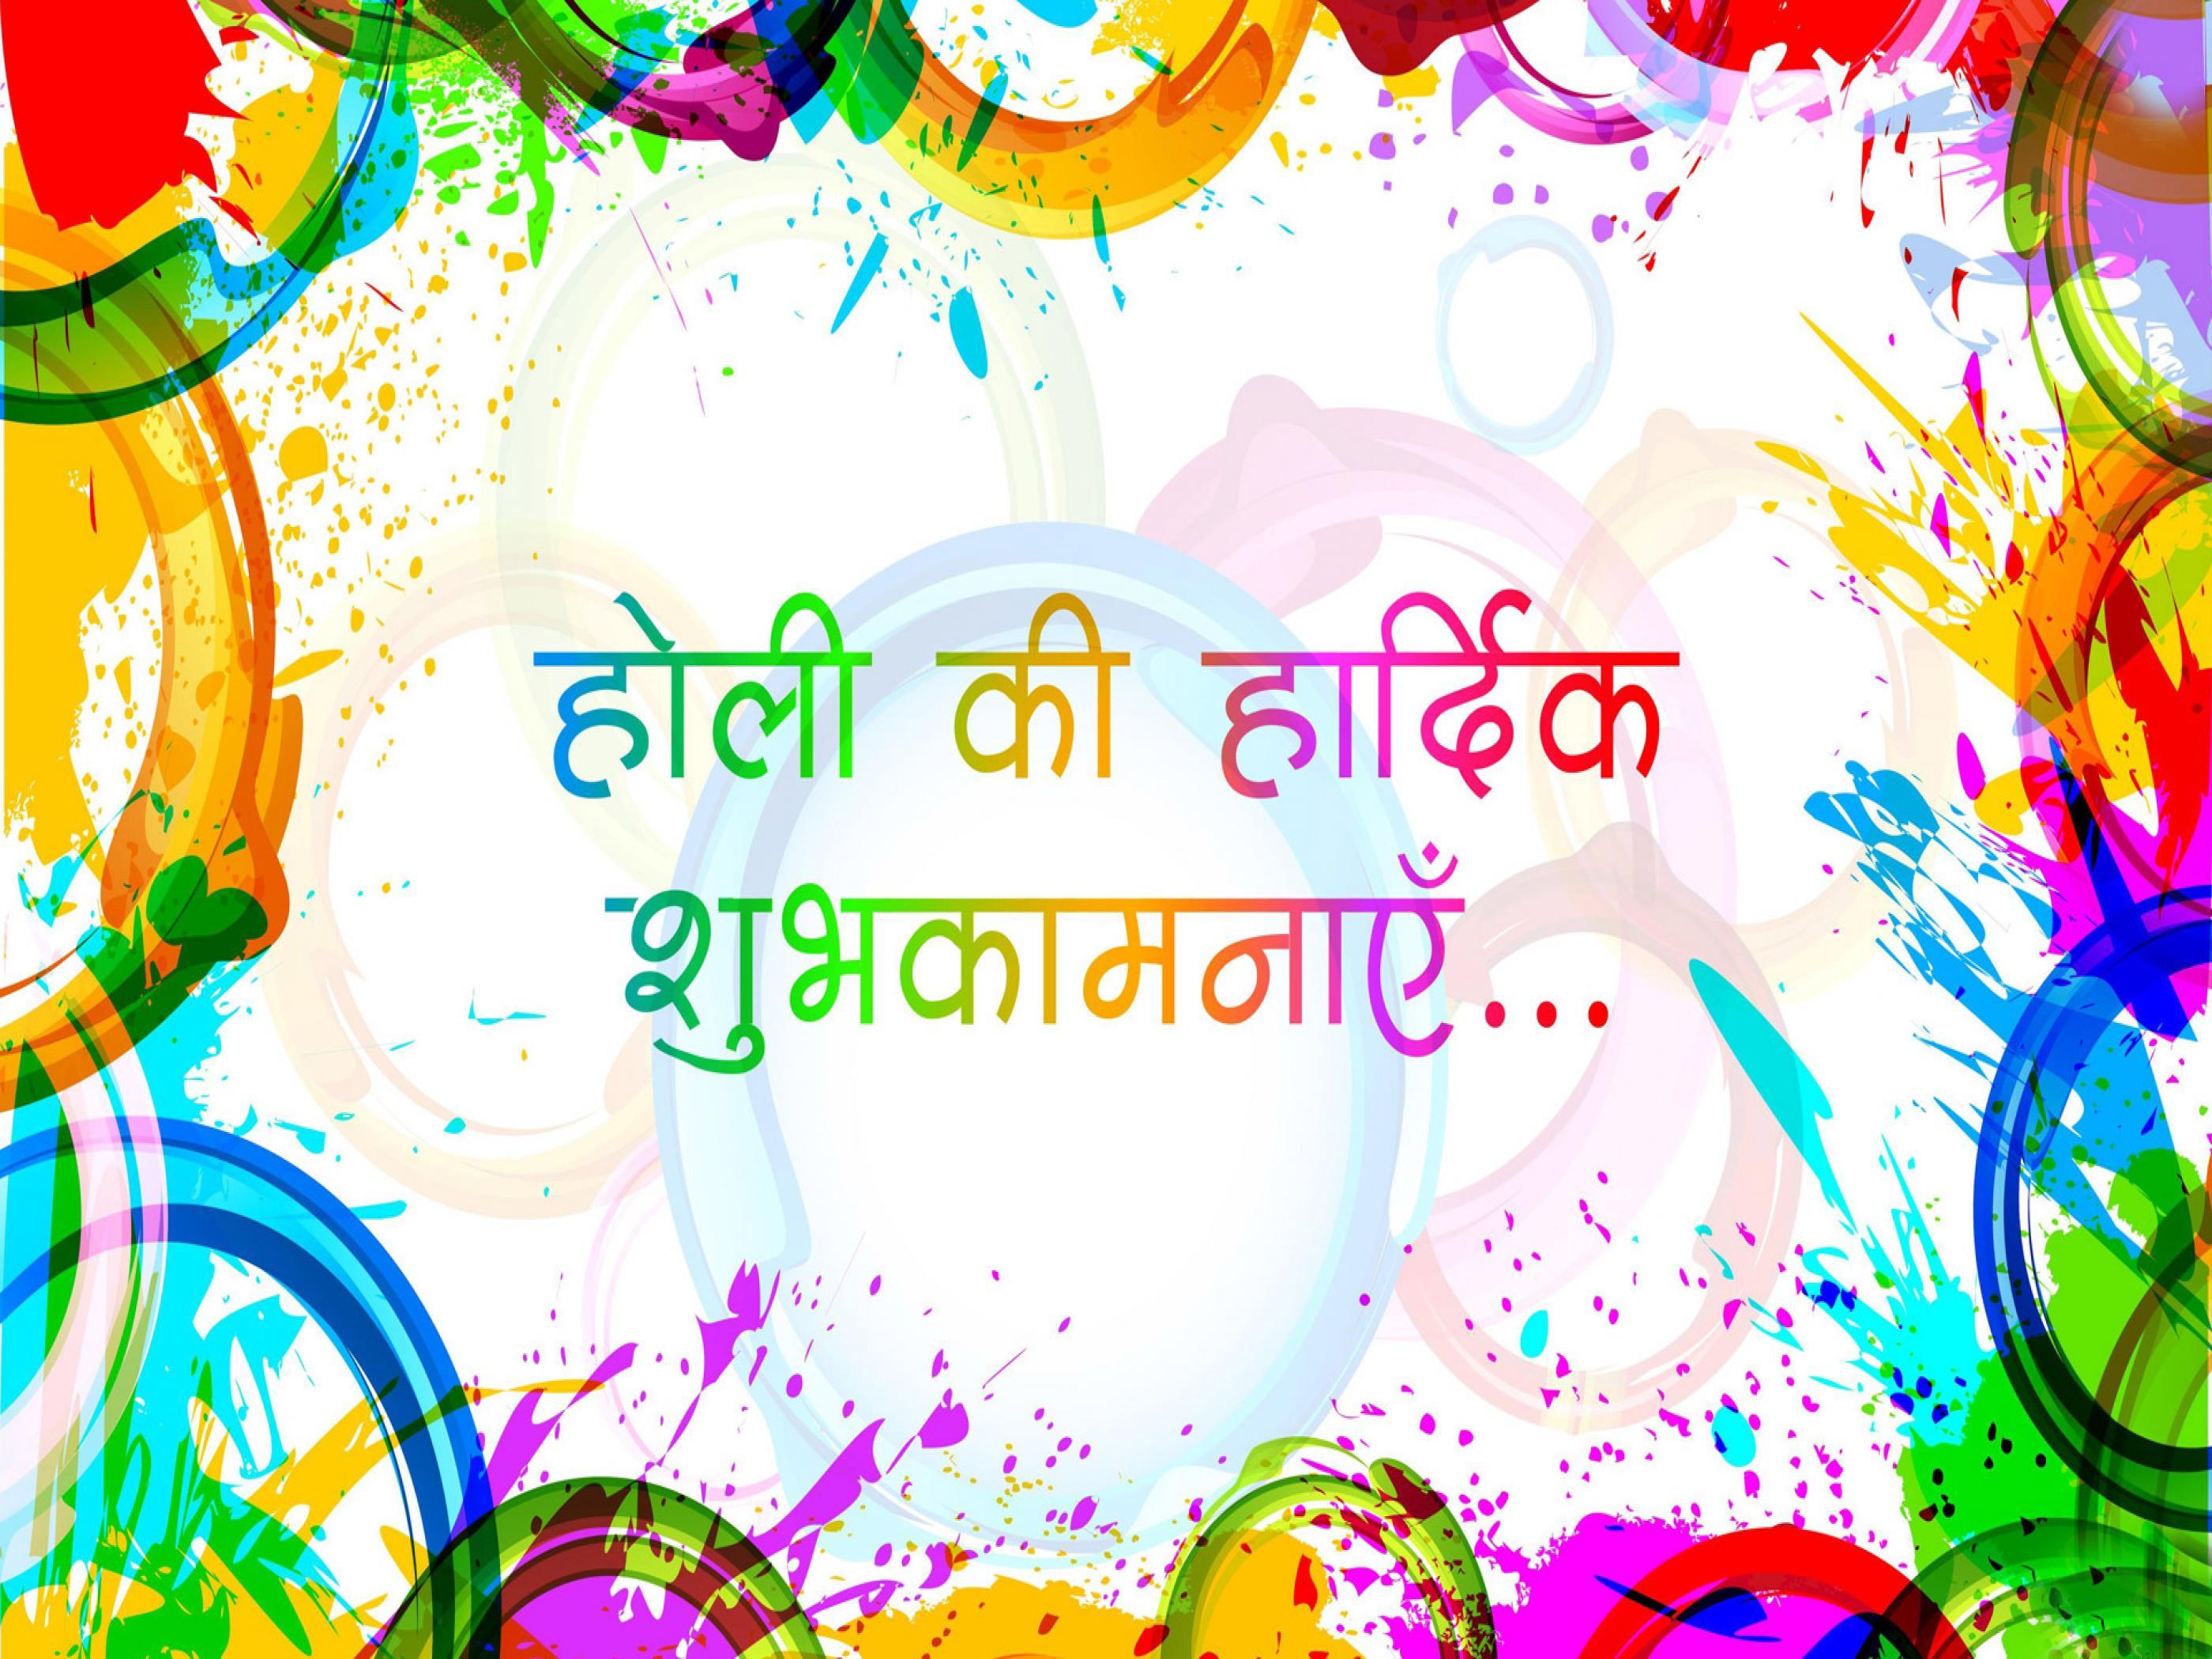 PunjabKesari, होली वॉलपेपर फोटो एचडी इमेज डाउनलोड,Holi Wallpaper Photo HD Image Download